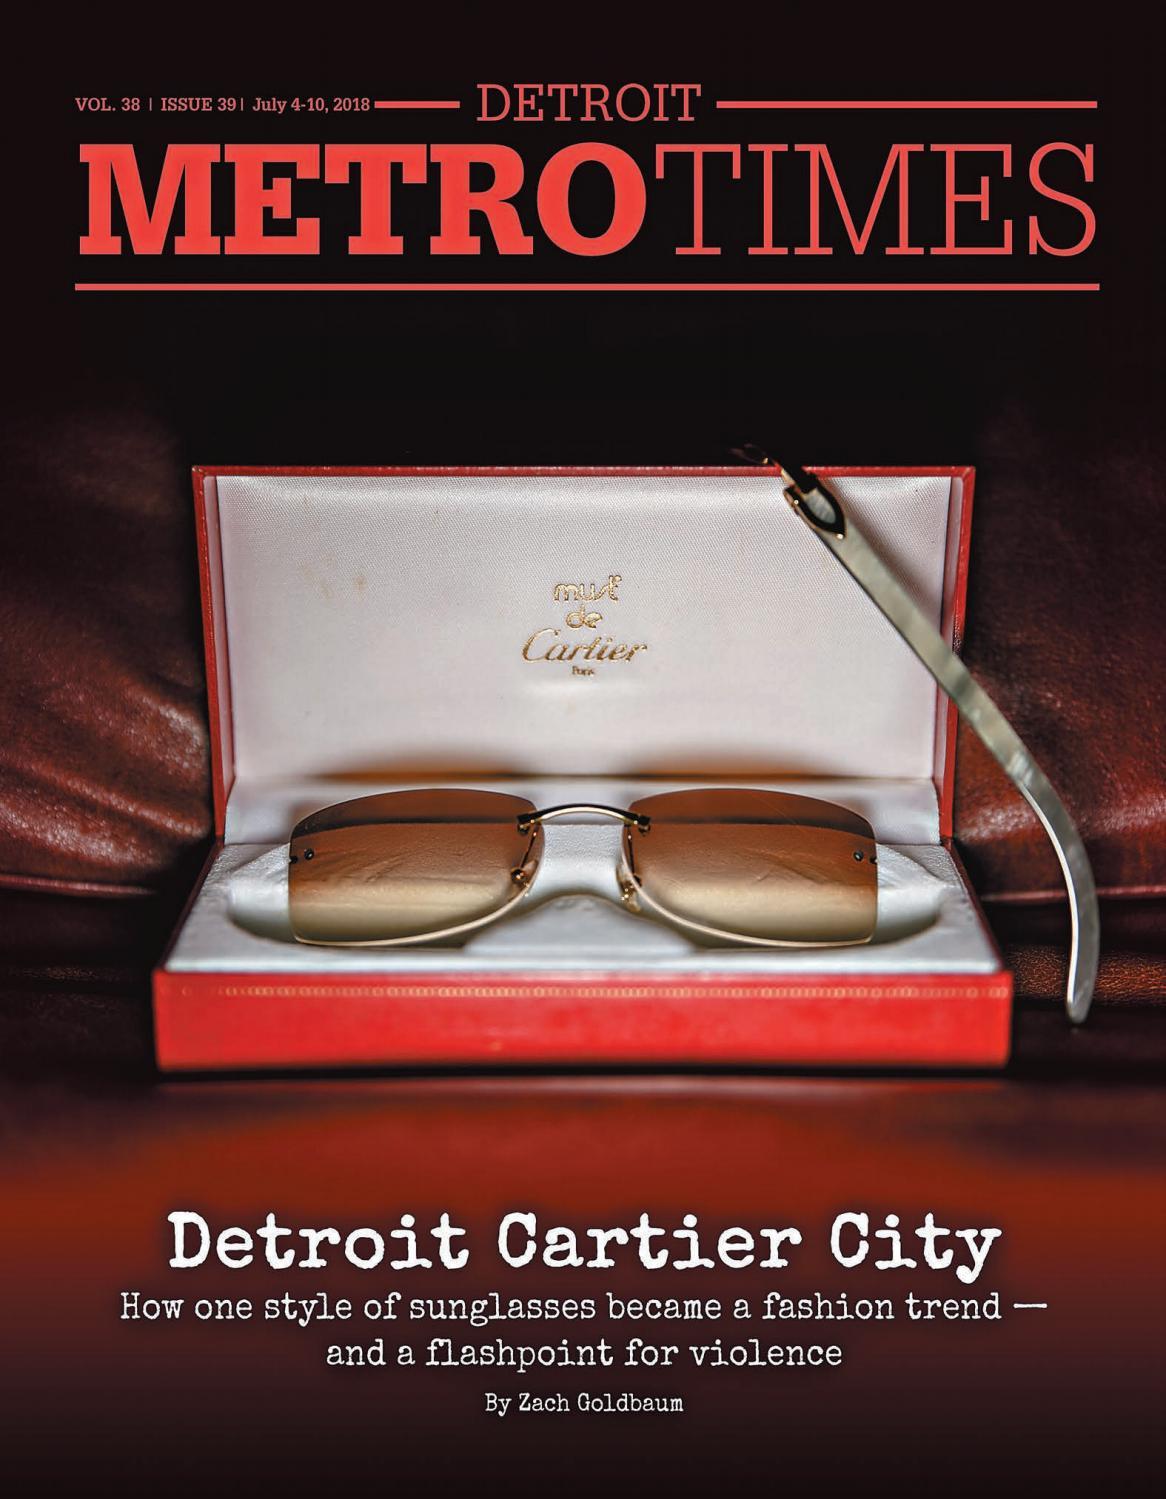 ac284b48395e Metro Times 070418 by Euclid Media Group - issuu